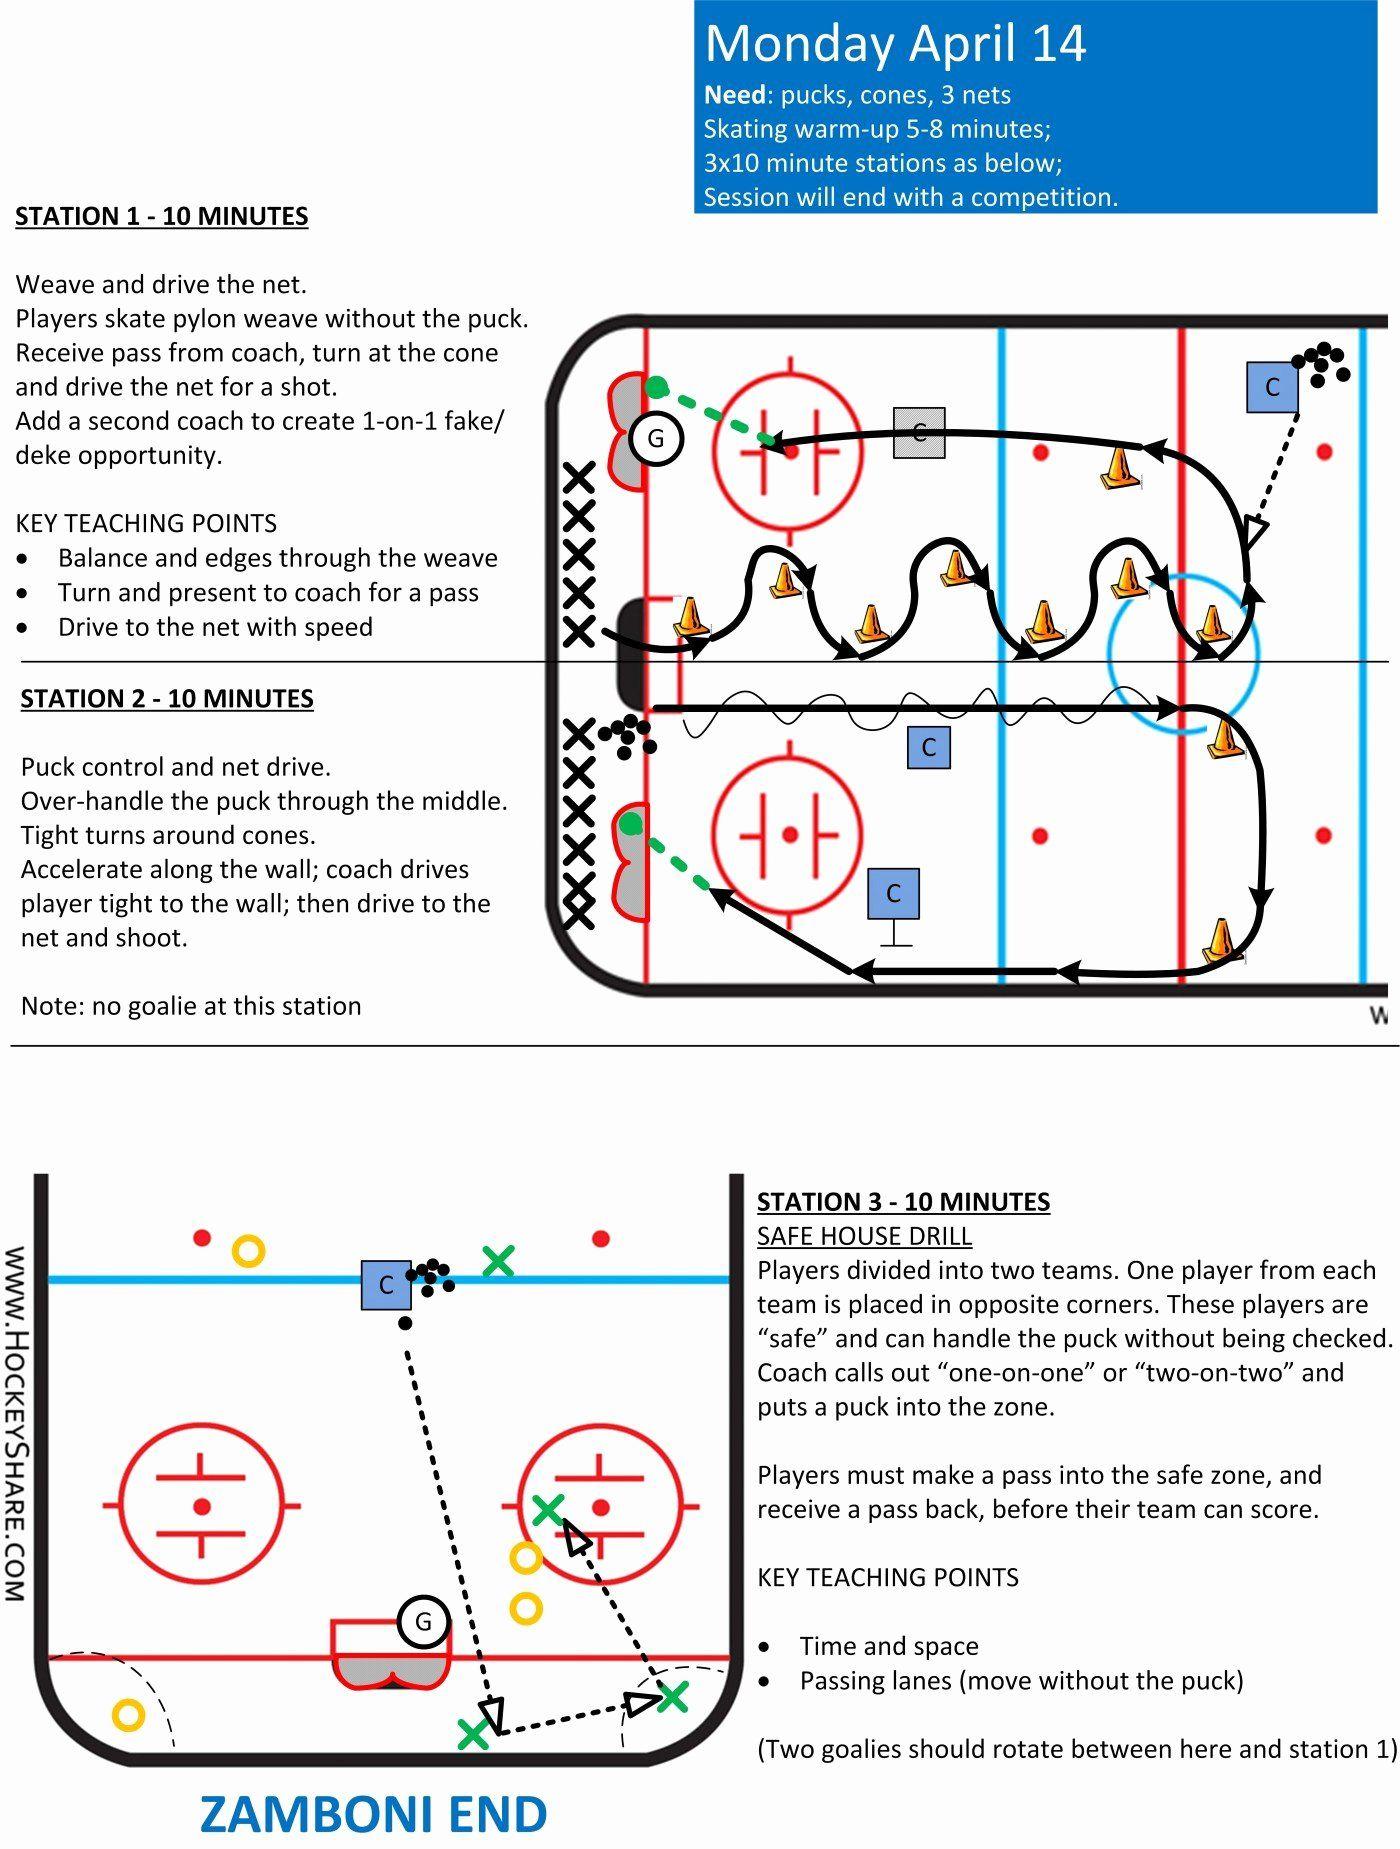 Hockey Practice Plan Template Best Of 022 Plan Template Hockey Practice Usa Football Hockey Drills Hockey Hockey Workouts